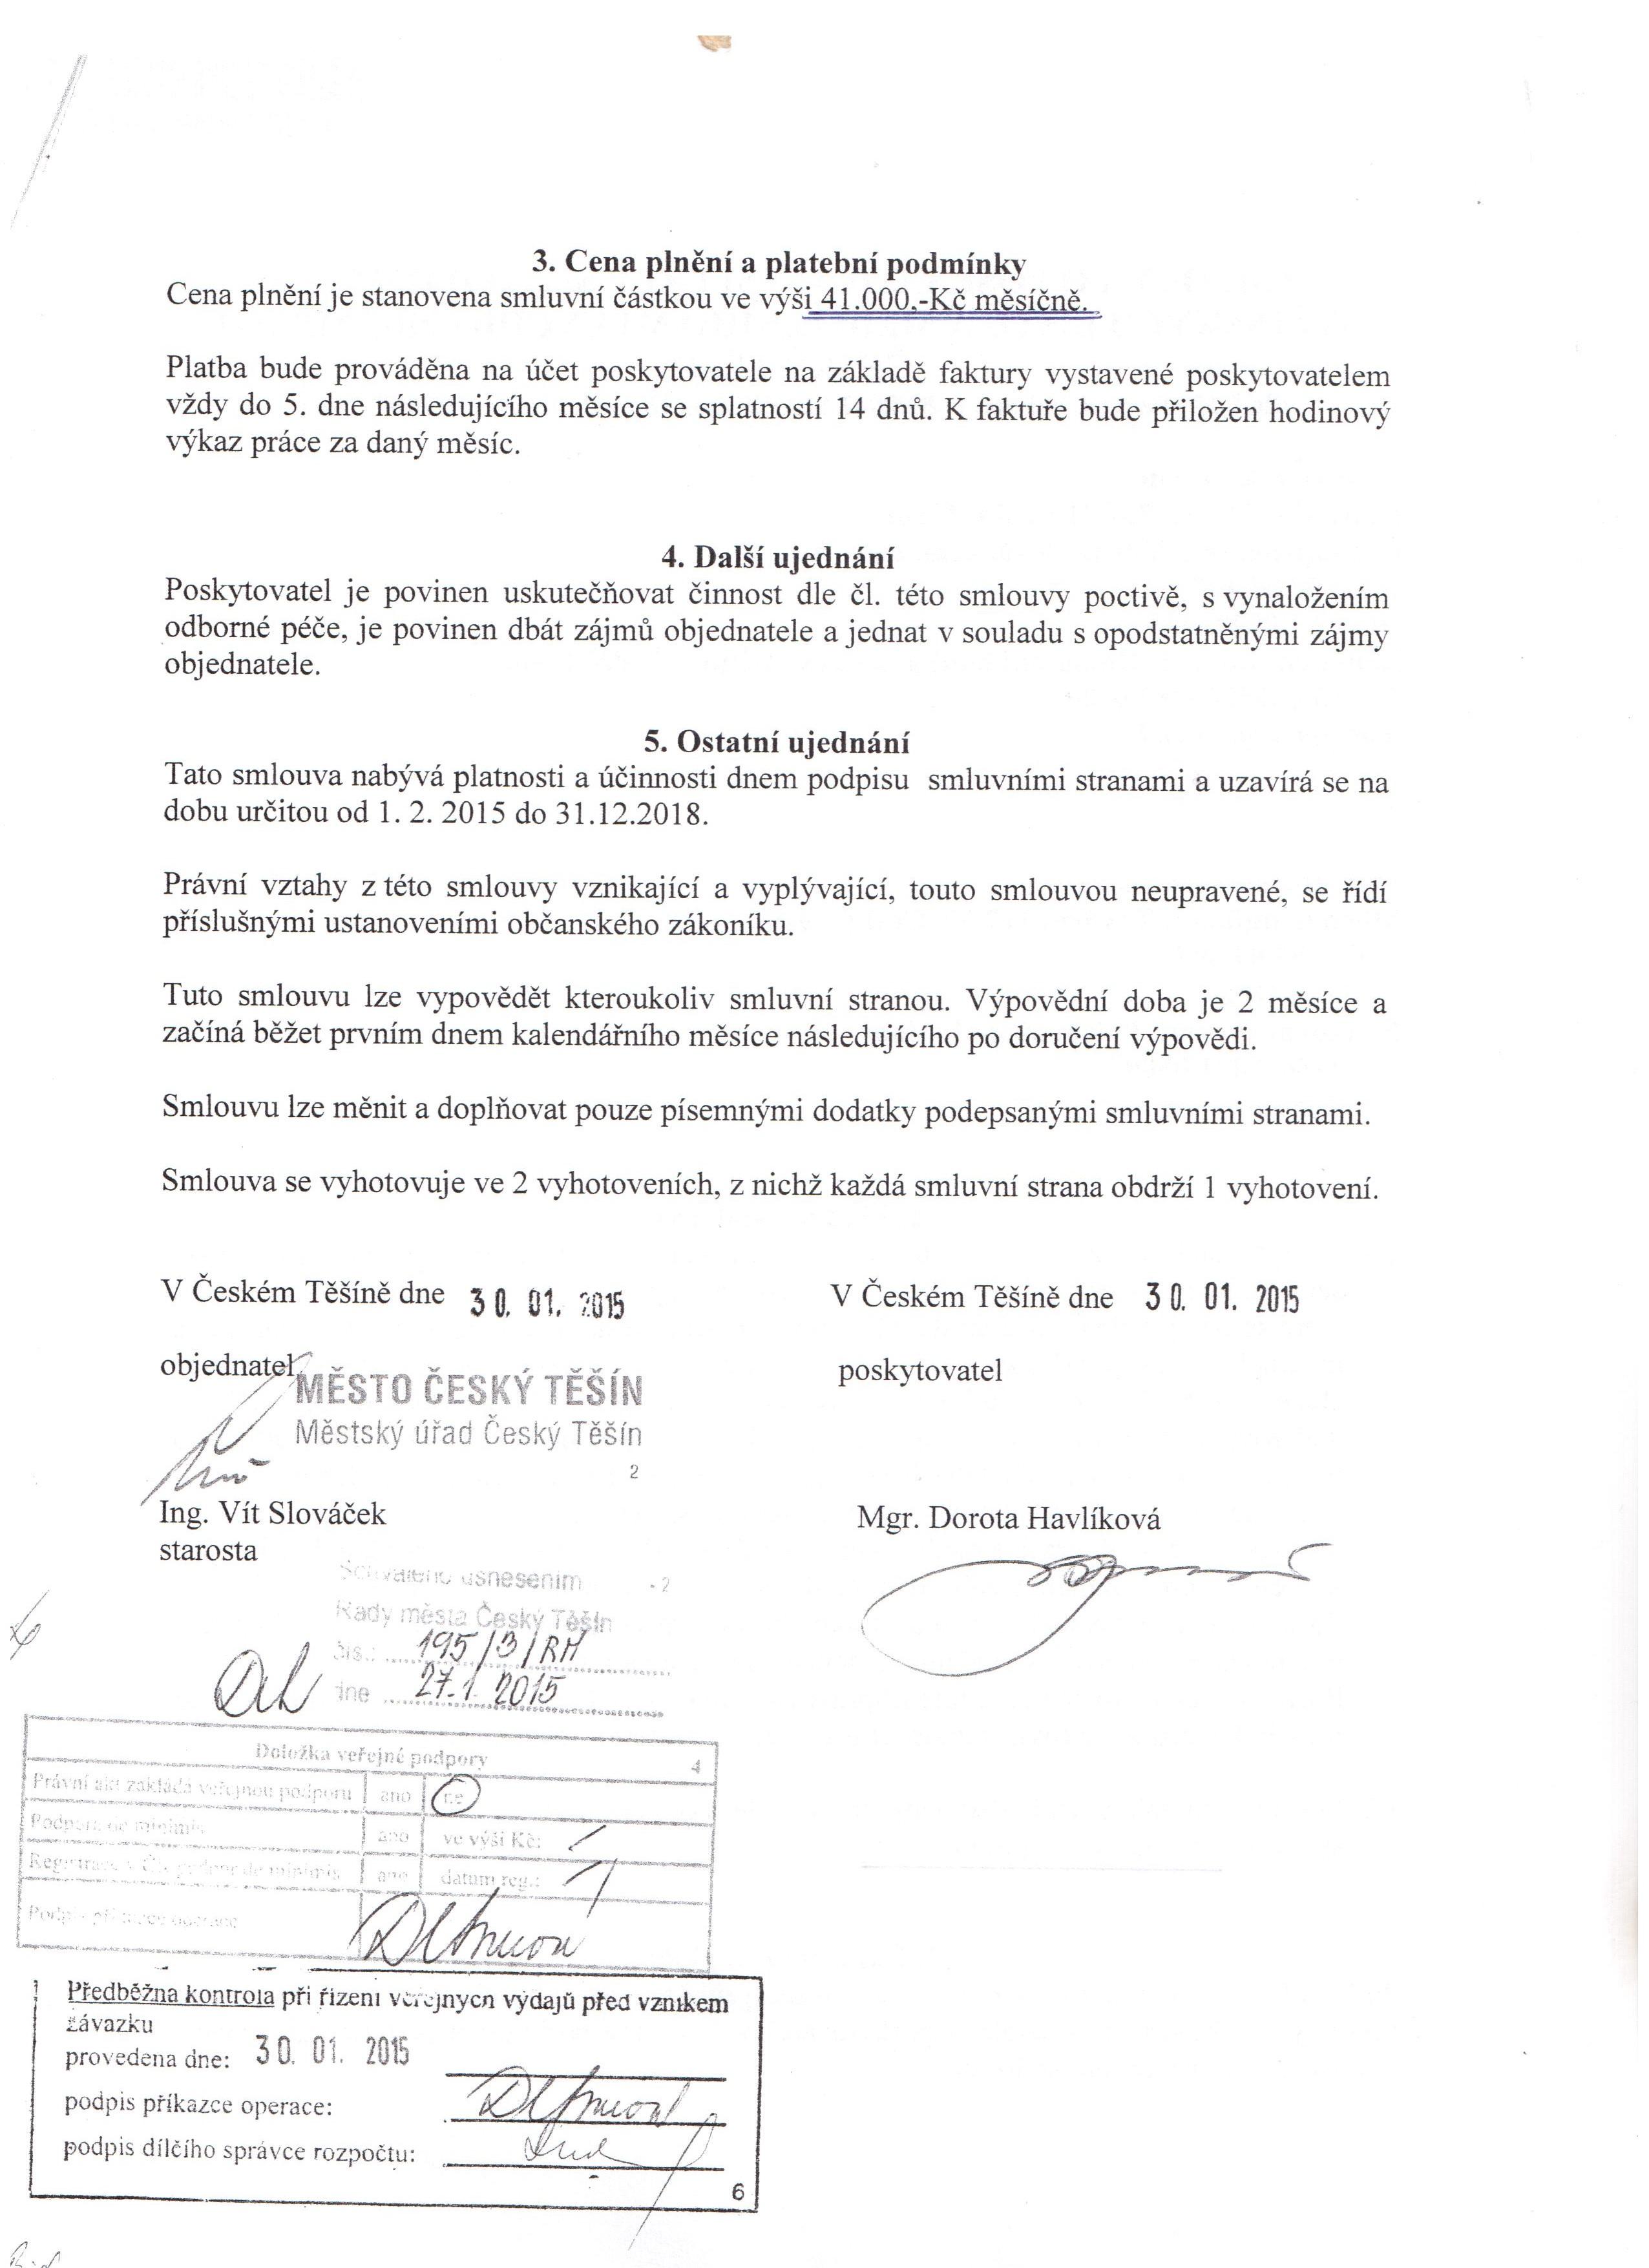 smlouva-havl-2-001.jpg